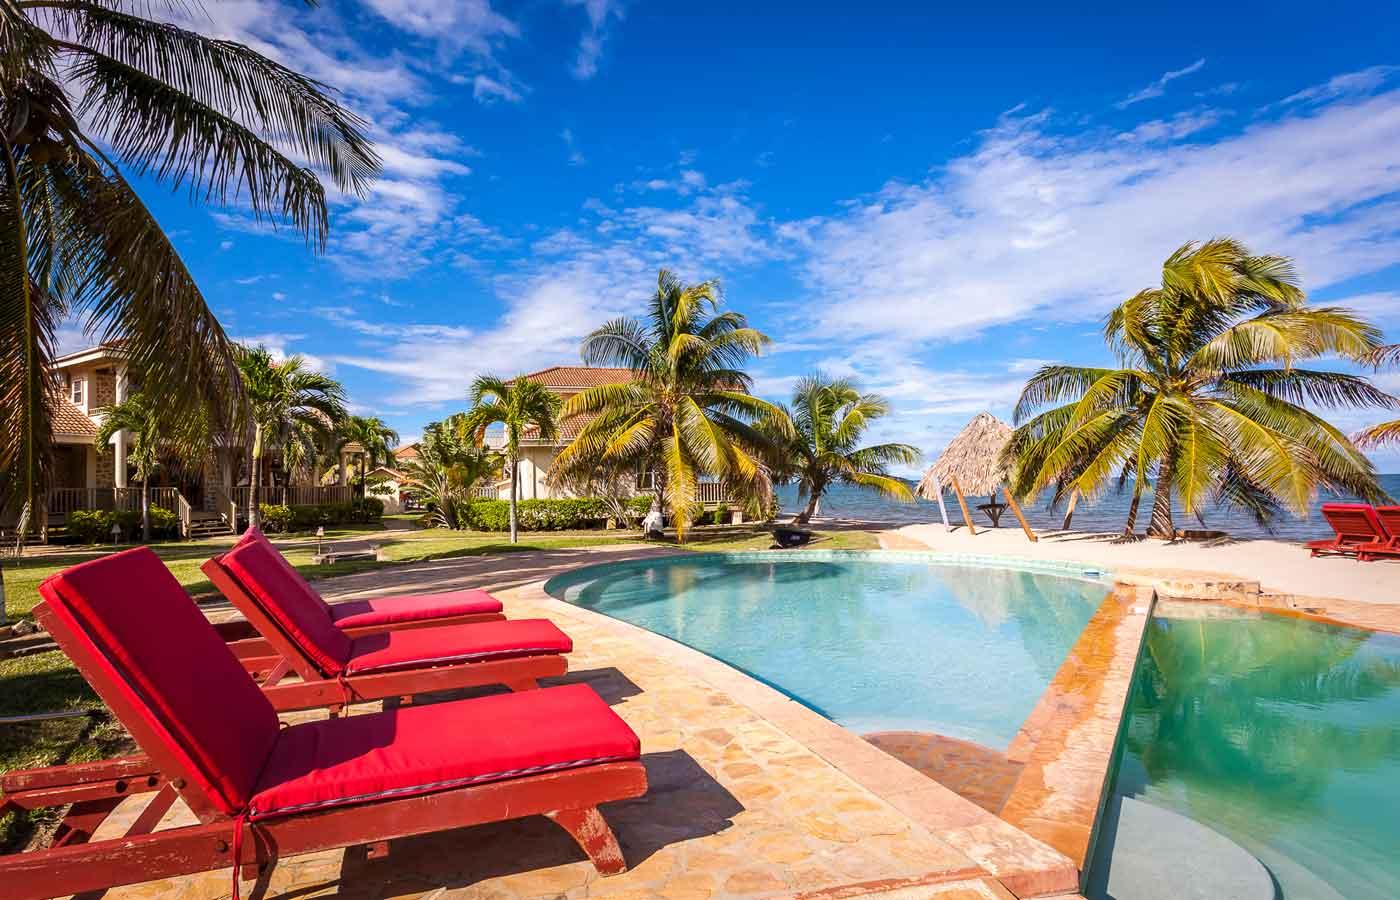 Hopkins Bay Resort, Belize, luxury belize, luxury holidays to Belize, tailor-made holidays to Belize,